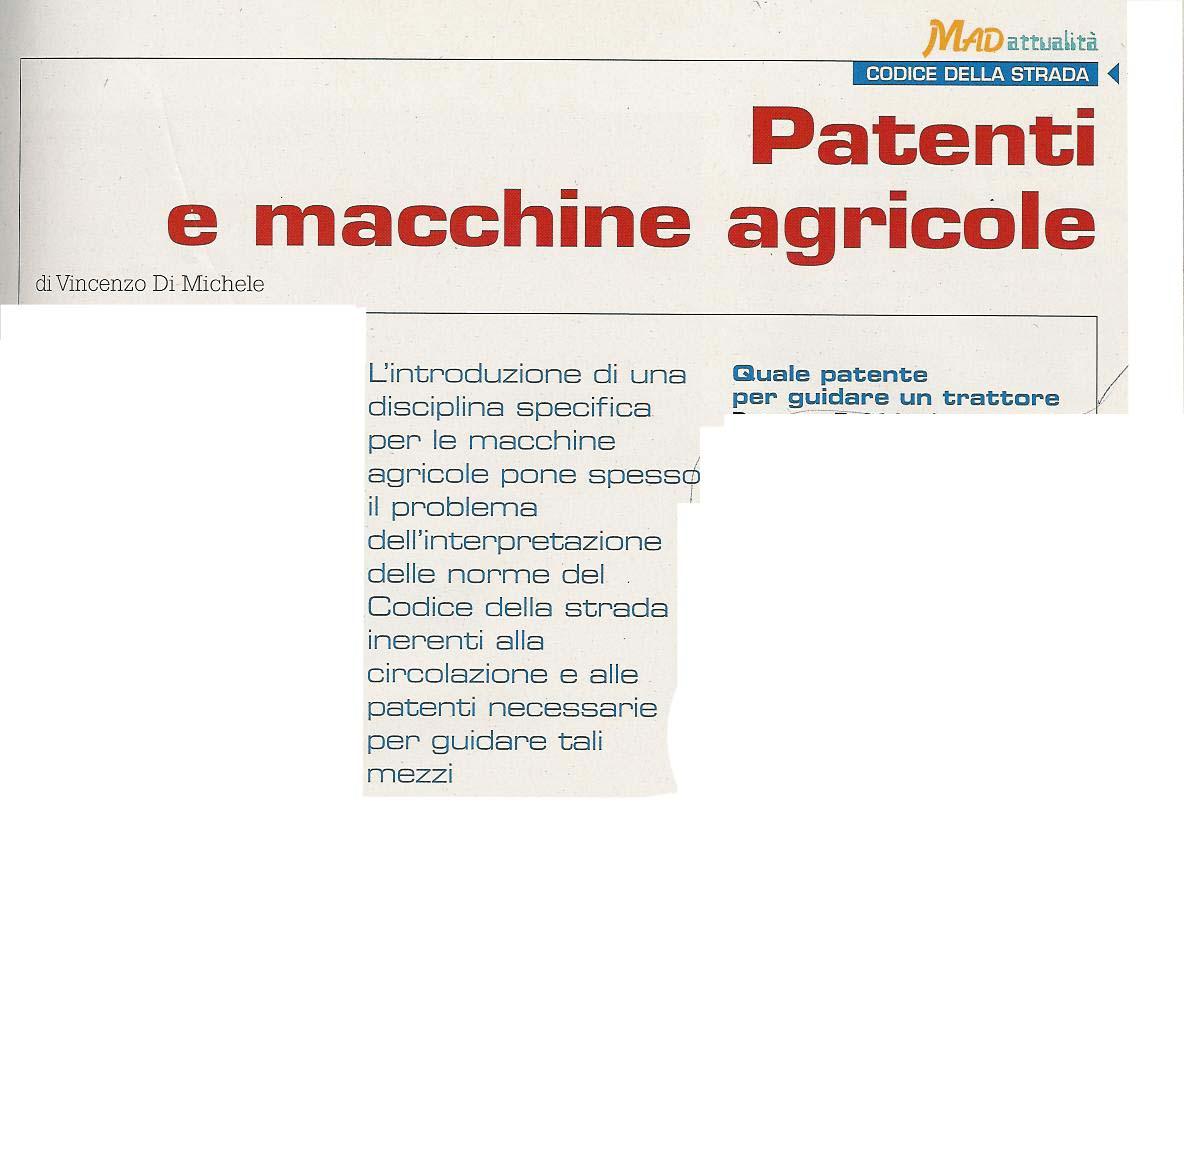 Mad (Macchine Agricole Domani)